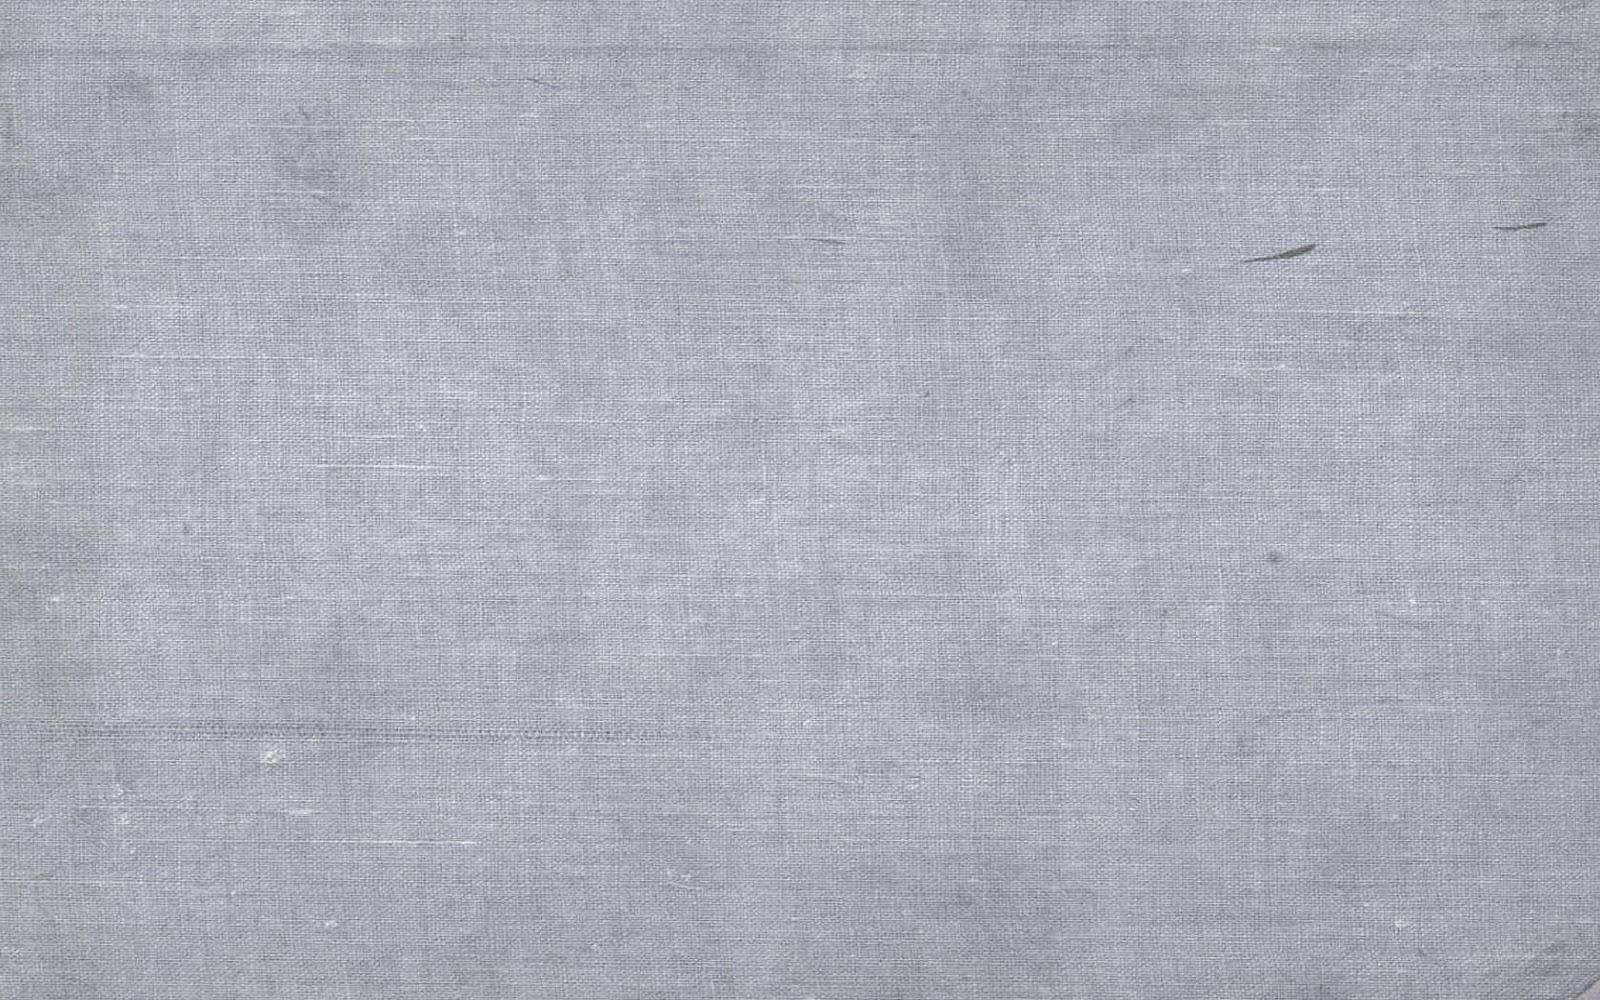 grey background tumblr - photo #11